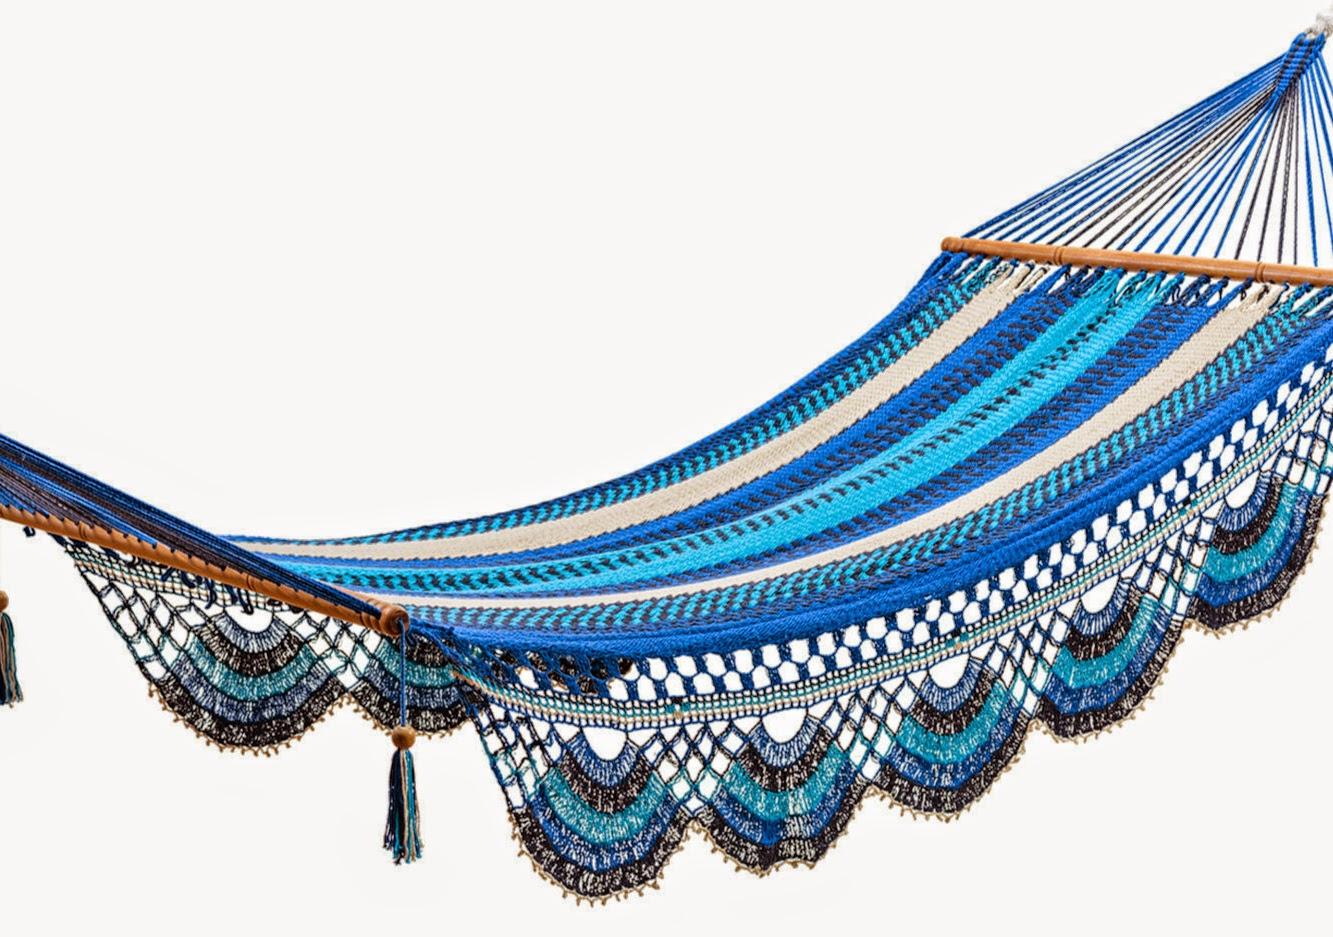 http://shop.unicefusa.org/handwoven-hammock/1UGG1522.html